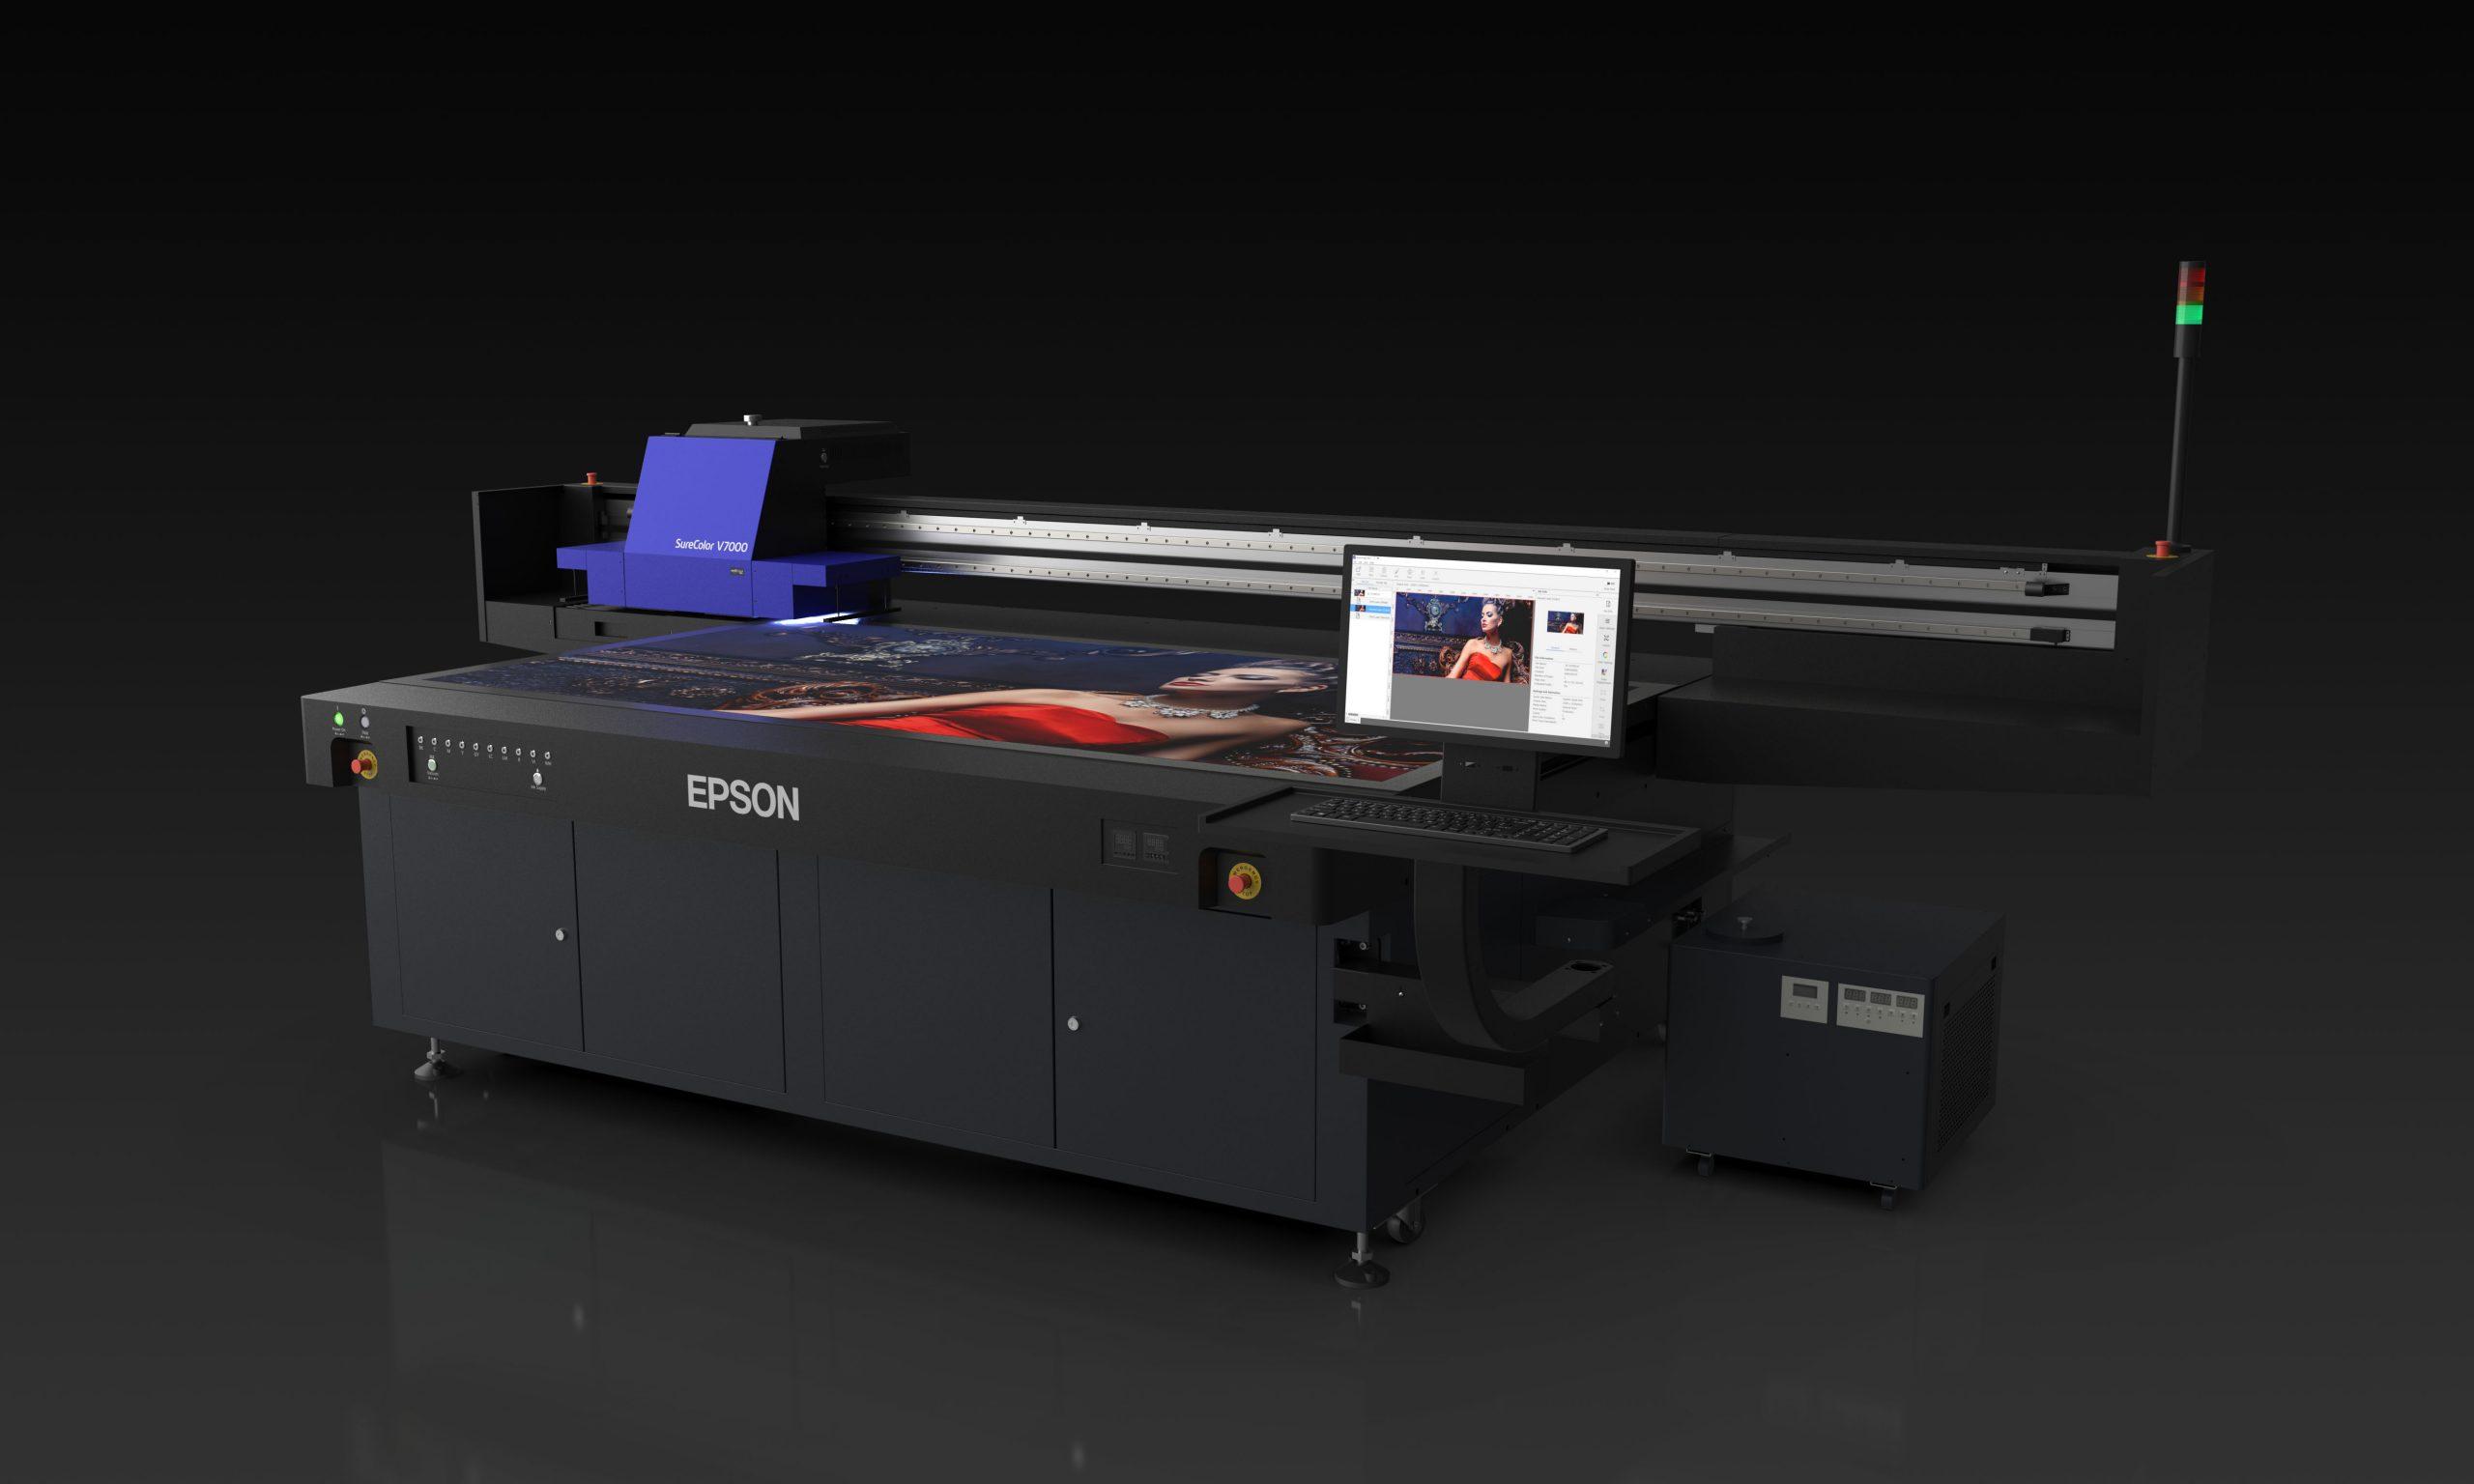 EPSON представя SureColor SC-V7000 плоскопечатен UV LED принтер